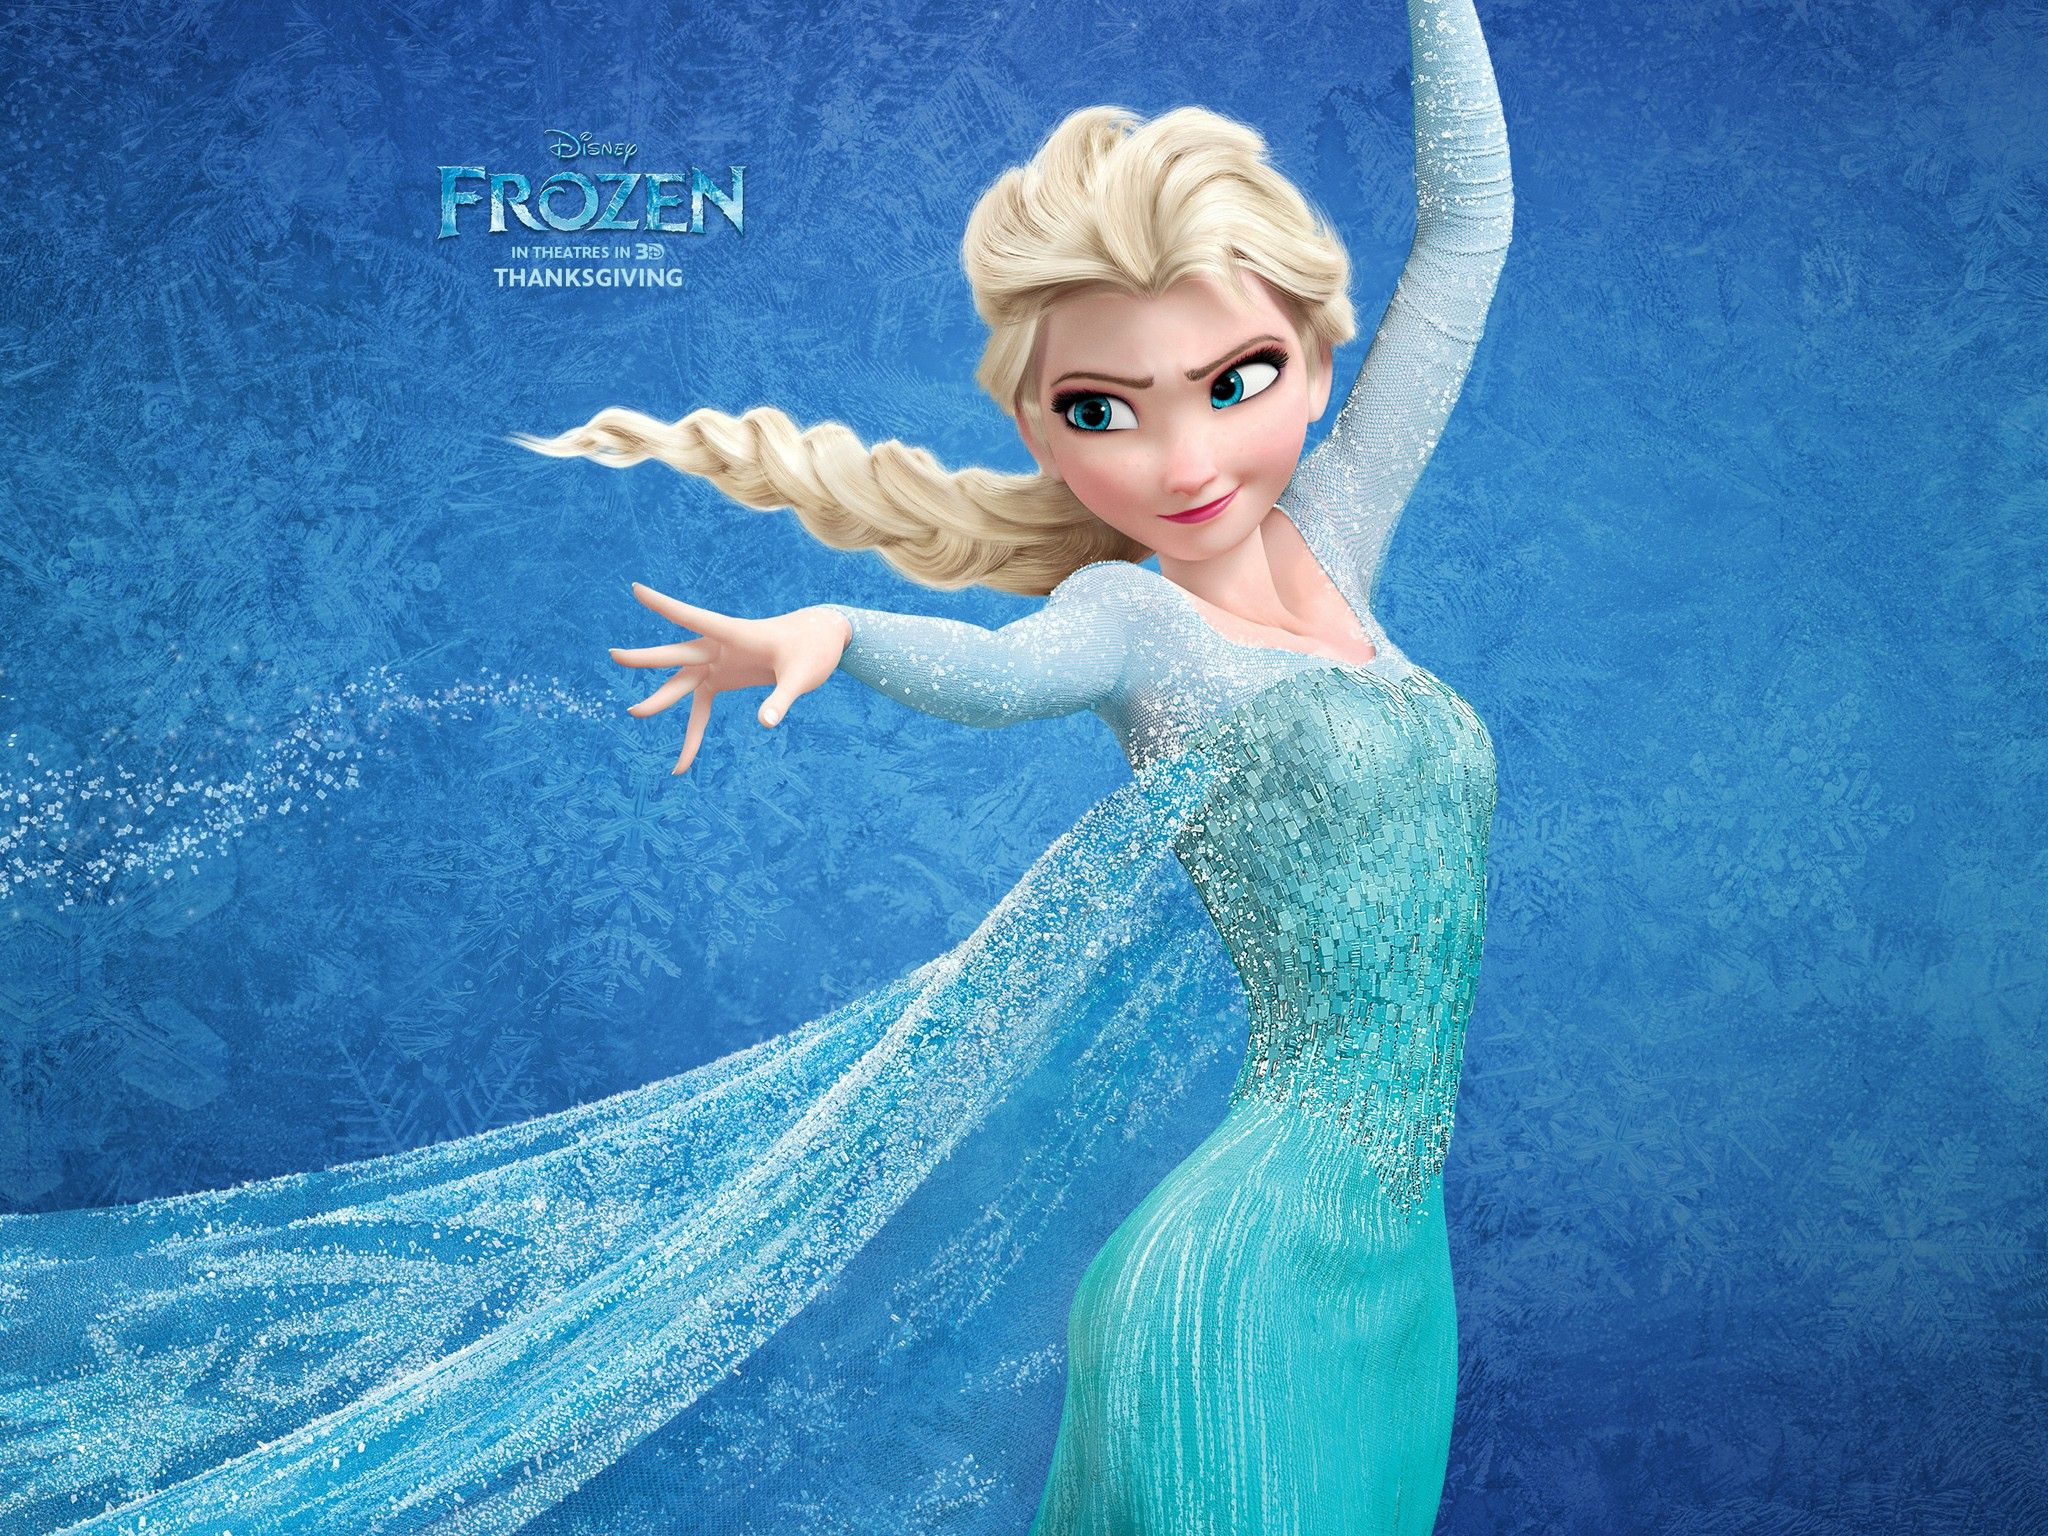 Elsa frozen wallpapers hd hd wallpapers pinterest elsa elsa frozen wallpapers hd voltagebd Choice Image